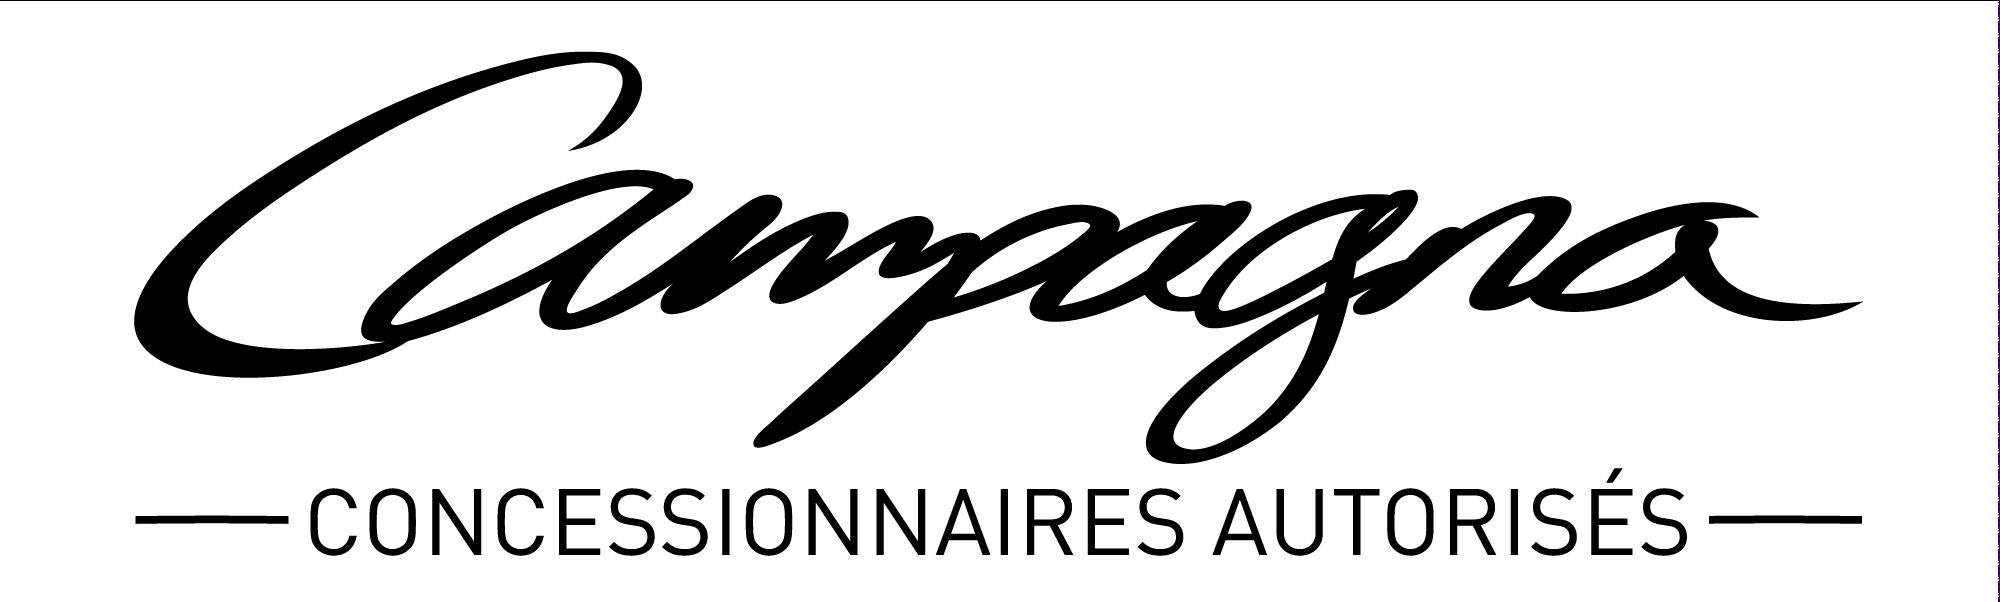 Signature-Campagna-Concessionnaires-Autorisés